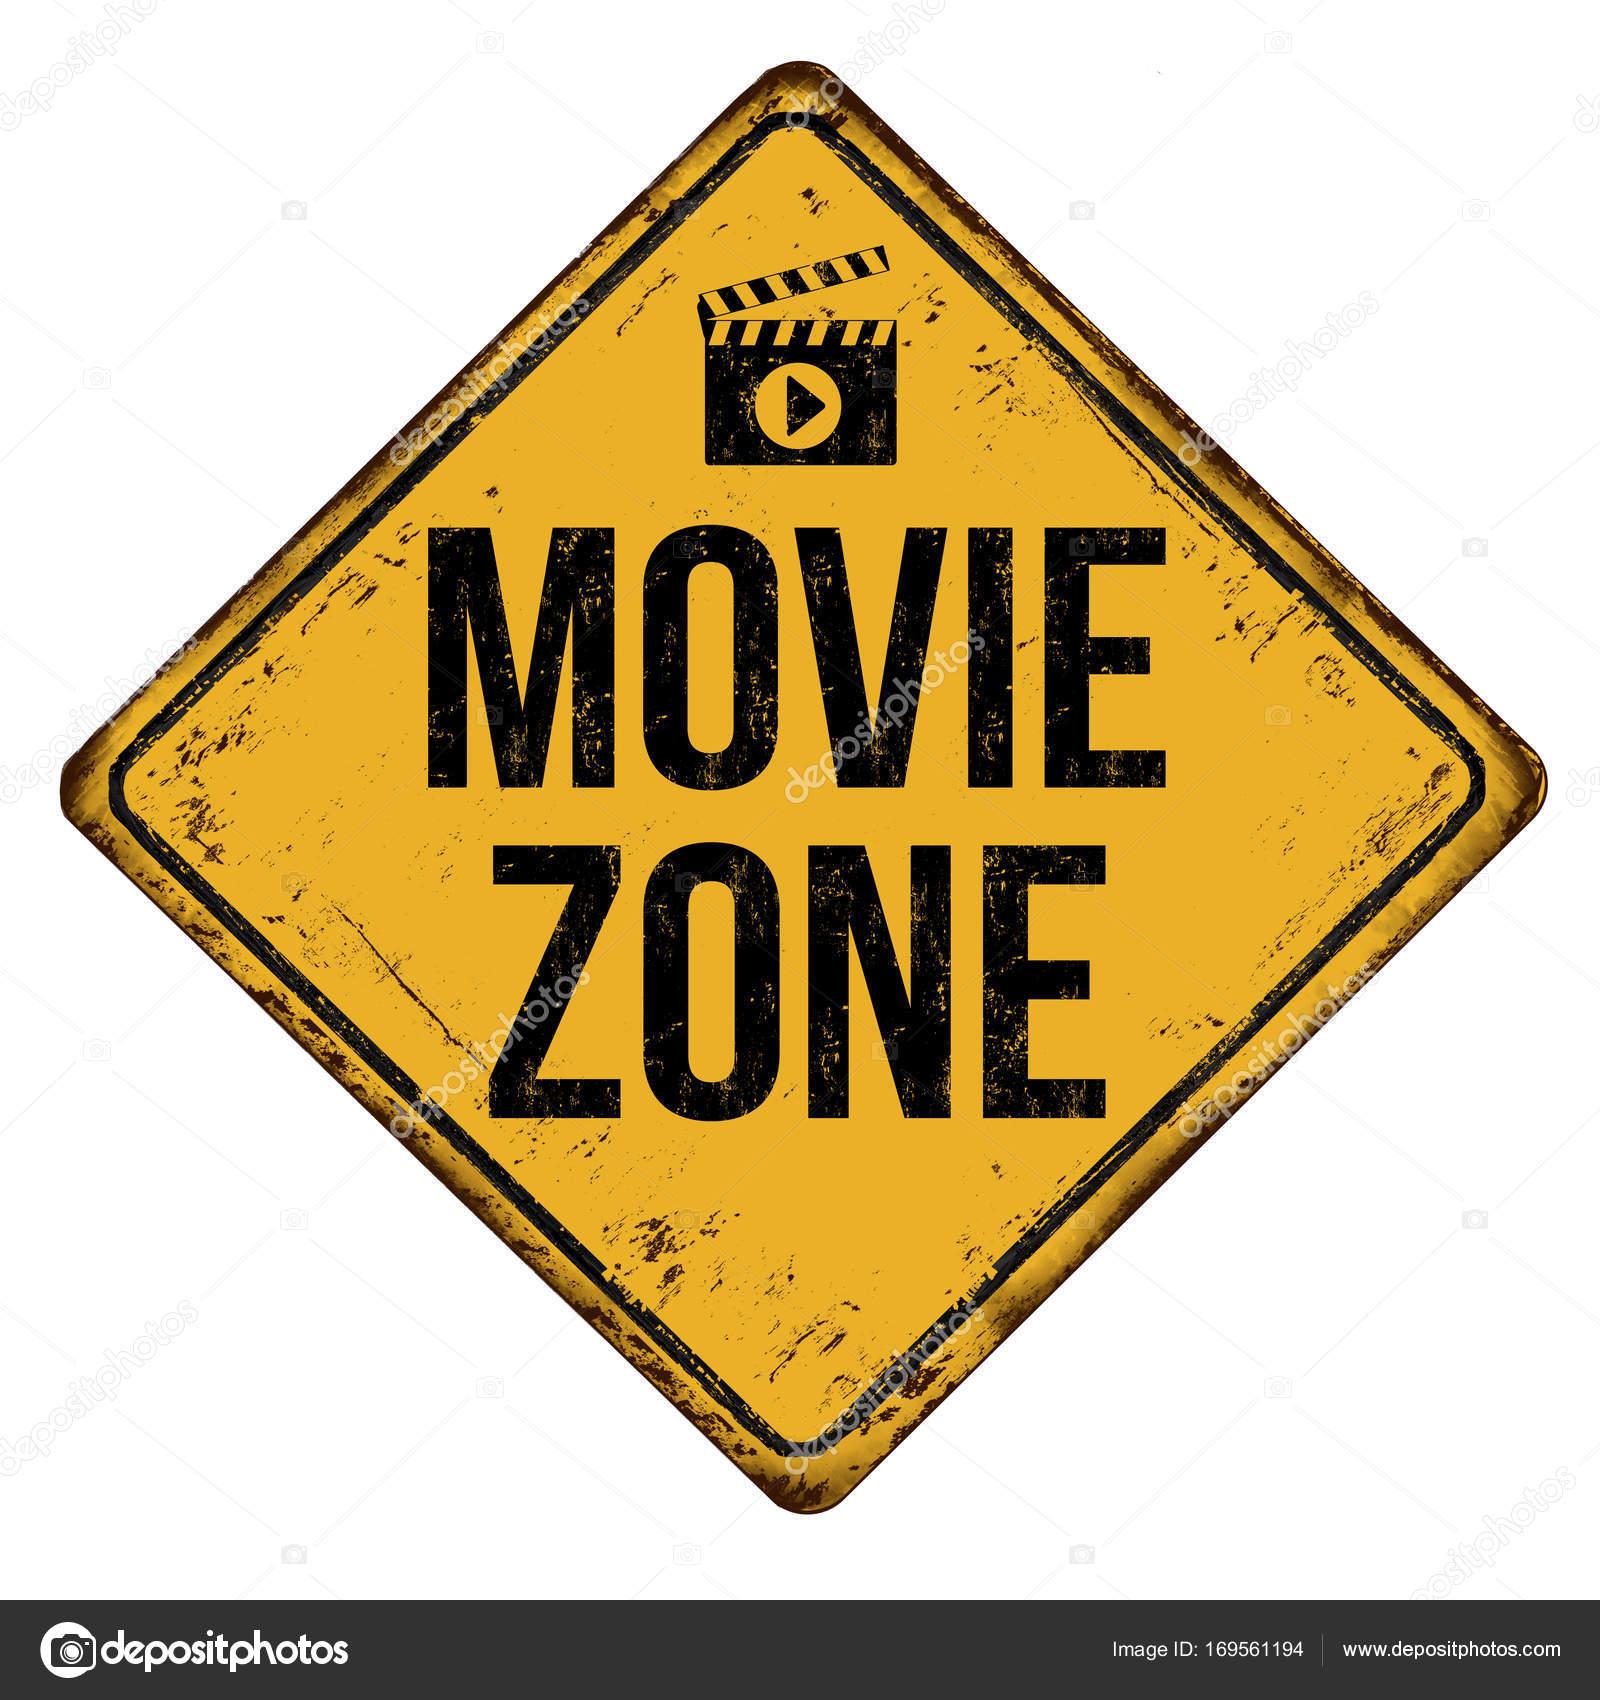 Free download film zone 261 download reviziontrust.